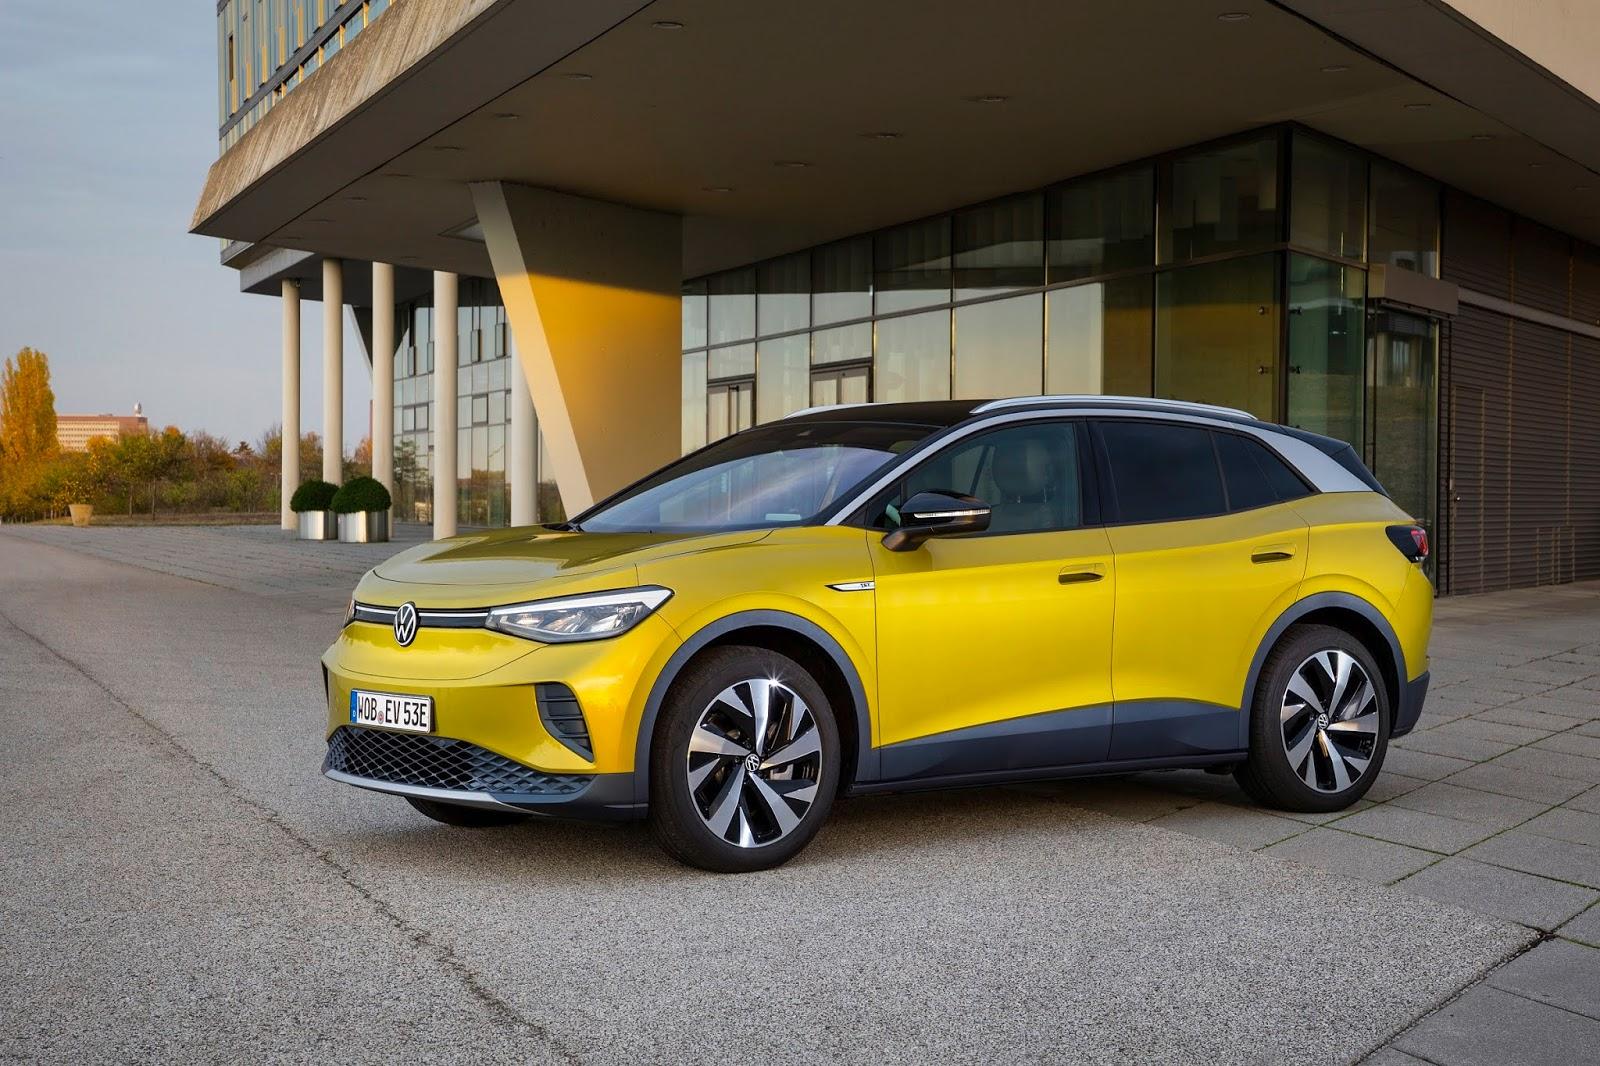 VOLKSWAGEN ID.4 Volkswagen : Κυρίαρχη στην ηλεκτροκίνηση το 2021 Electric cars, electric vehicles, Hybrid, plug-in hybrid, Volkswagen, zblog, ειδήσεις, ηλεκτρικά, ηλεκτροκινηση, υβριδικό